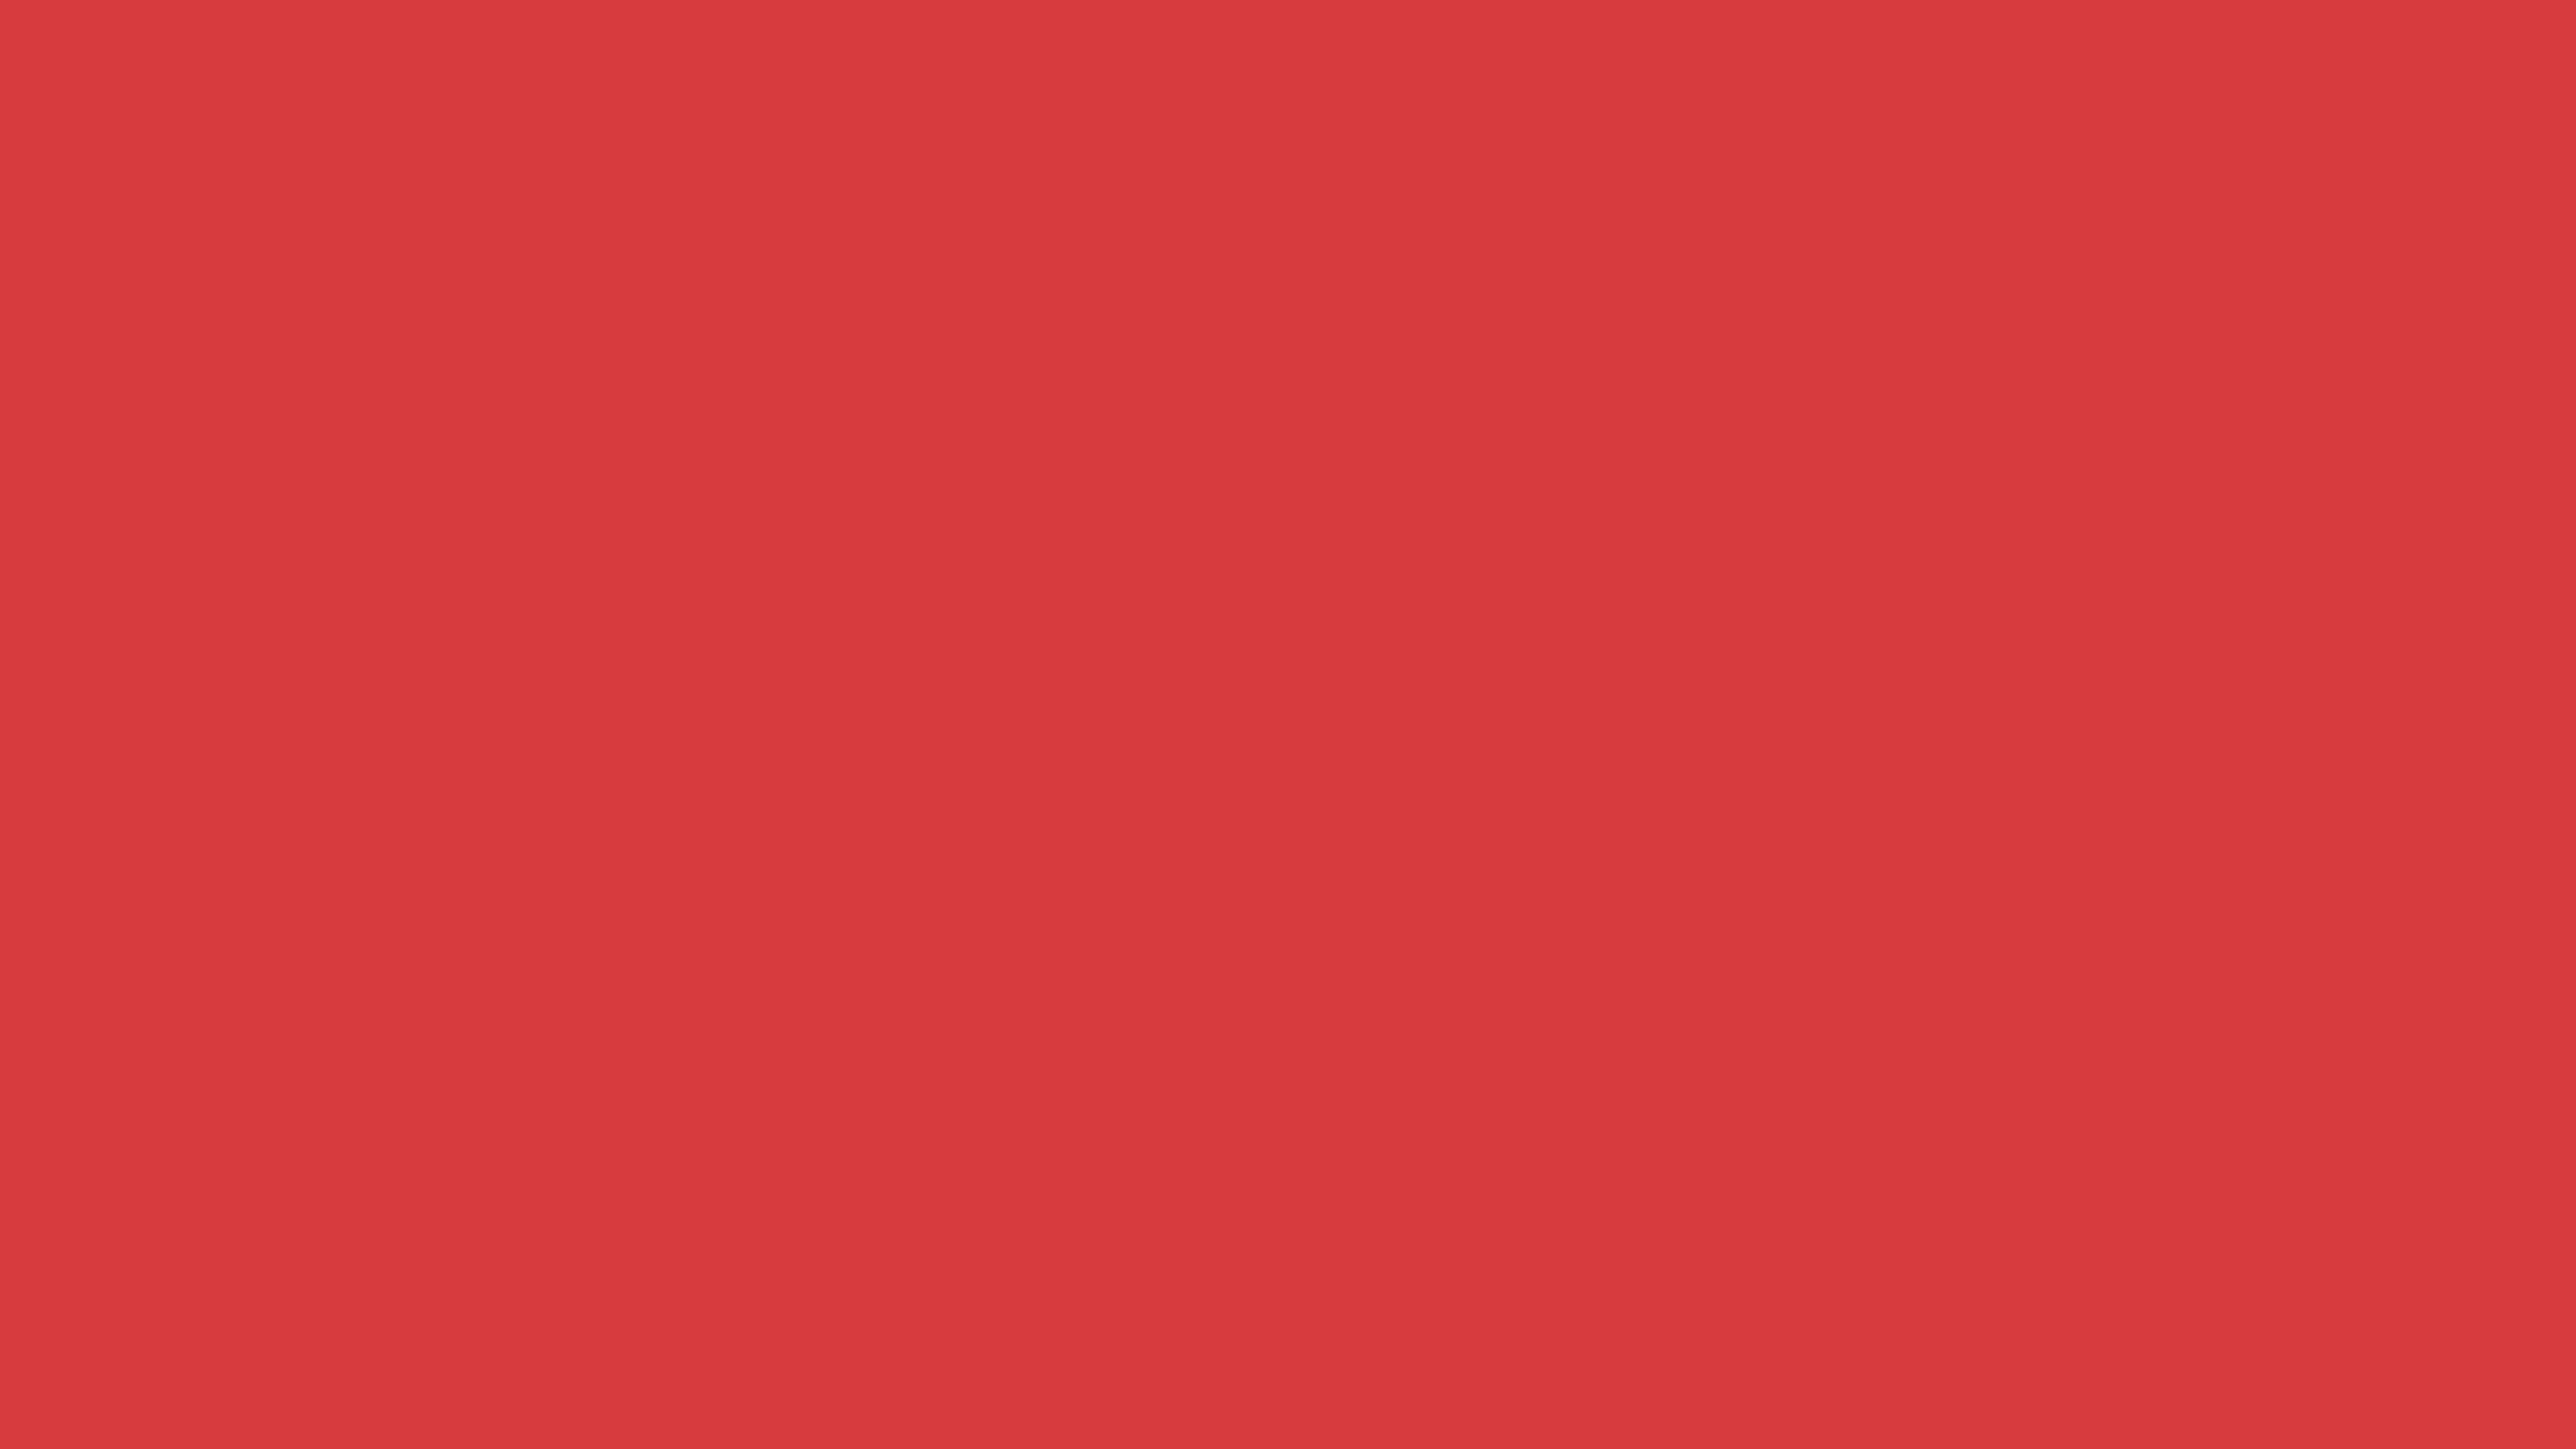 3840x2160 Jasper Solid Color Background